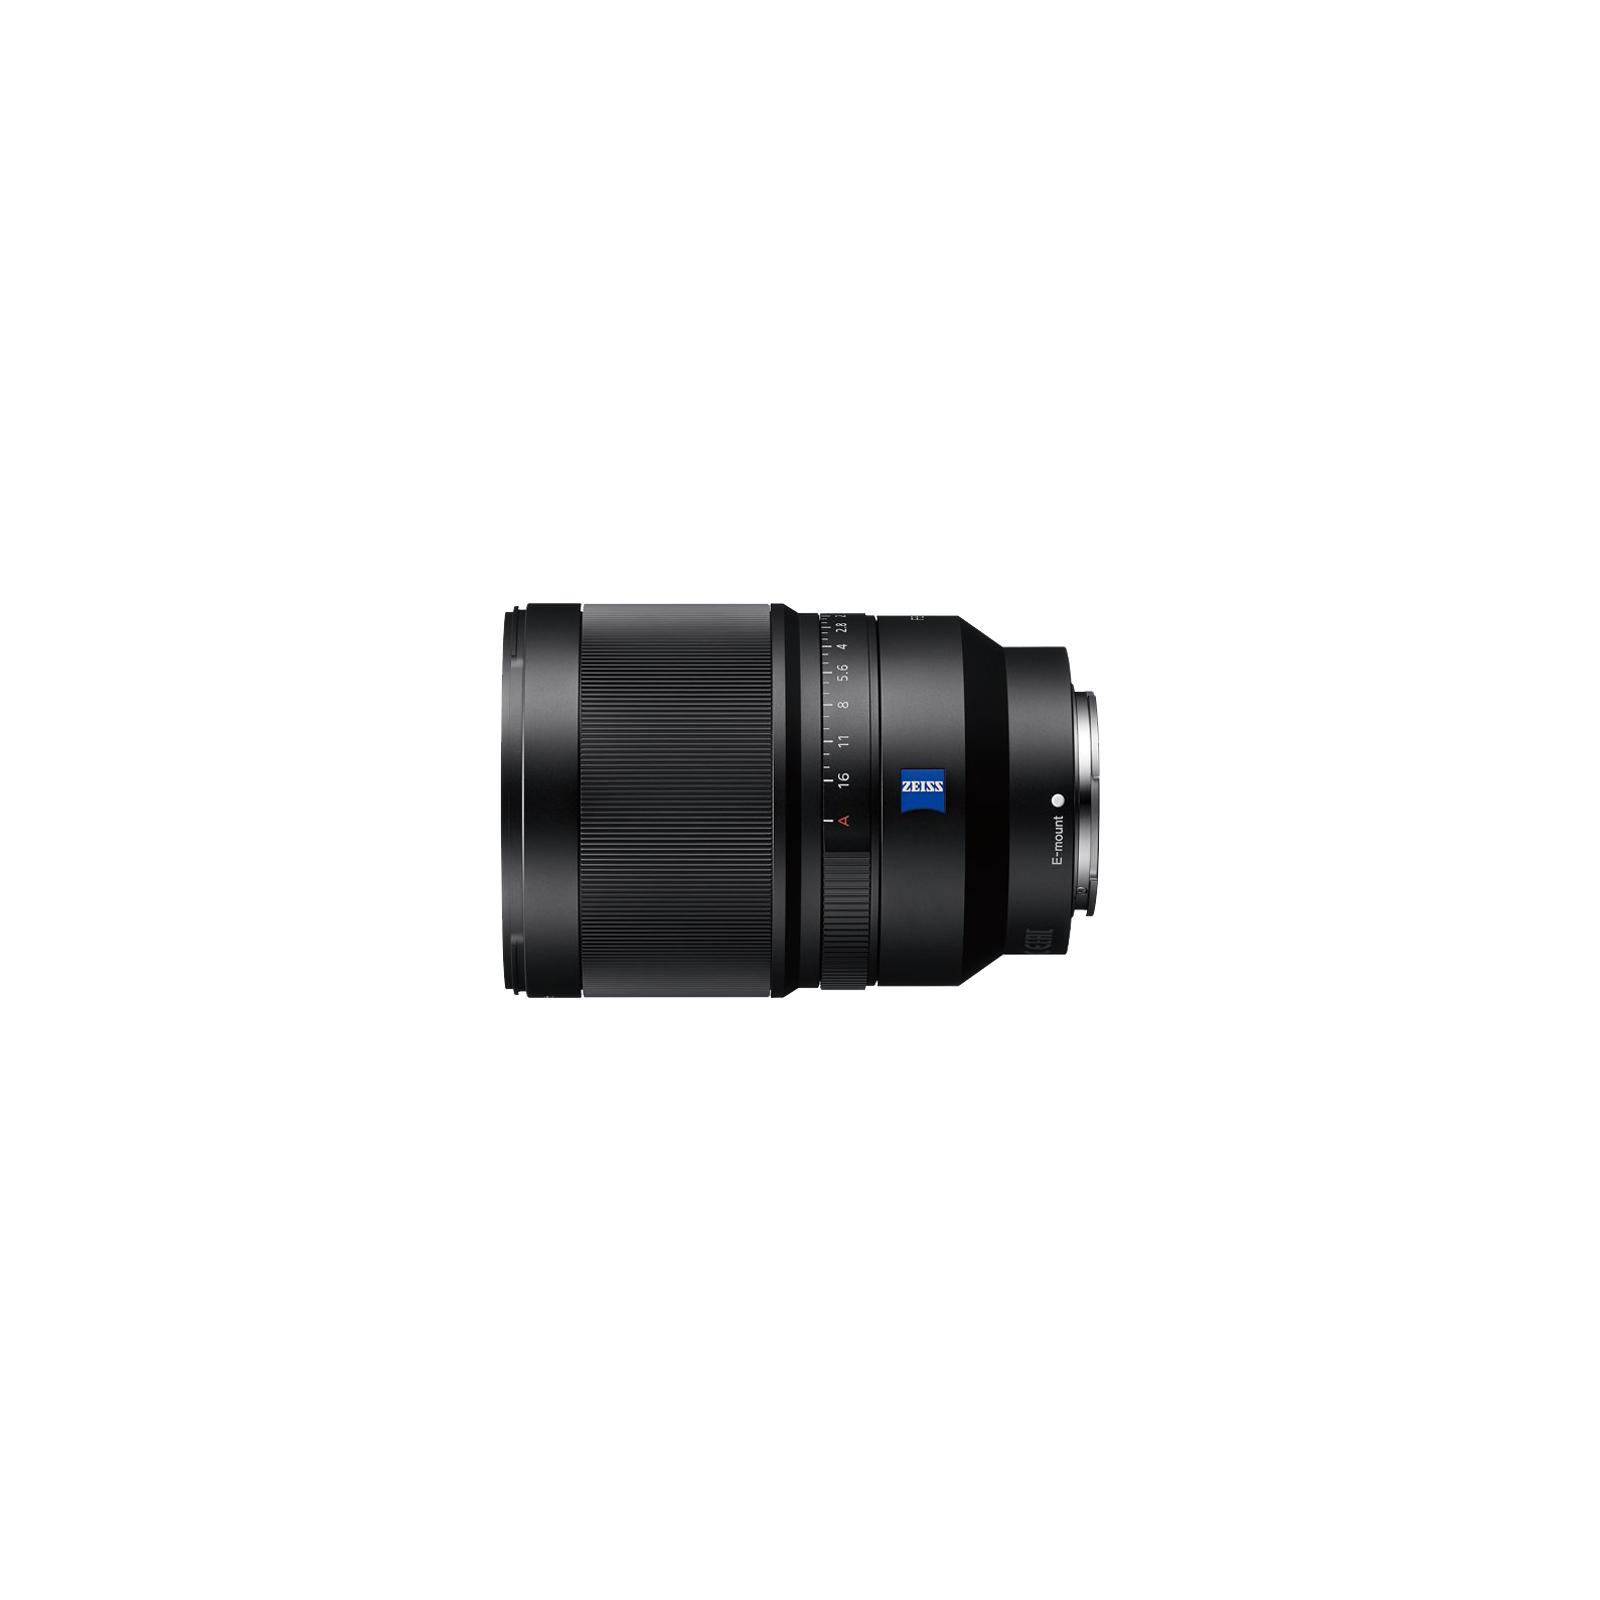 Объектив SONY 35mm f/1.4 (SEL35F14Z.SYX) изображение 2